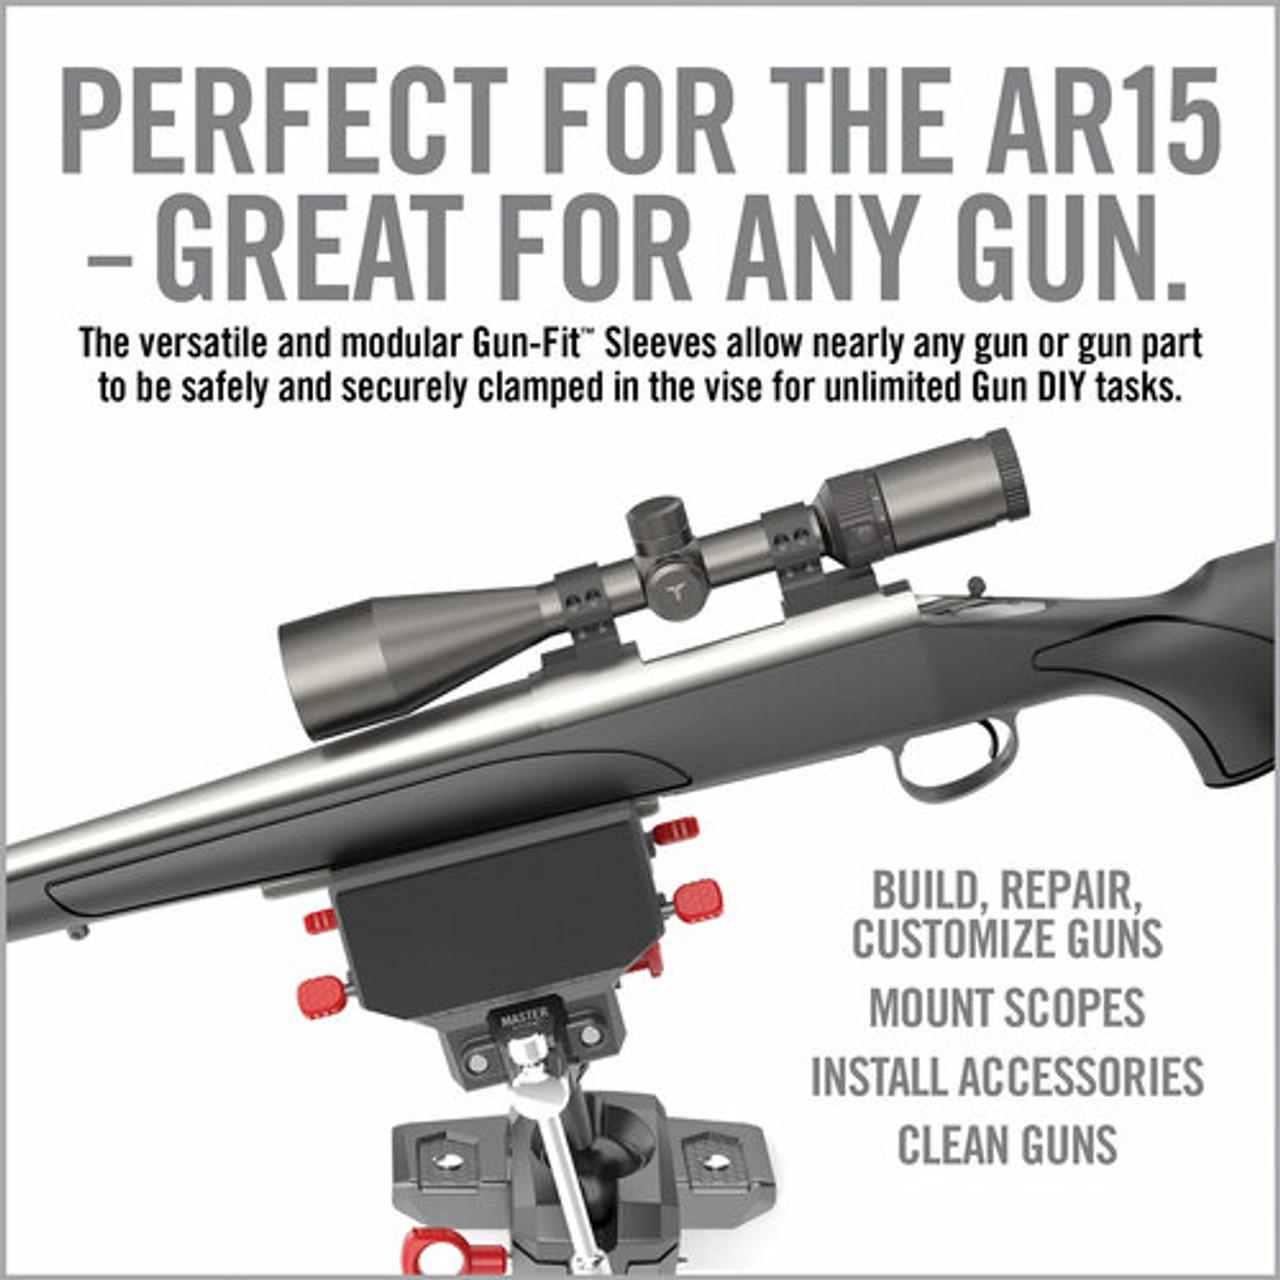 Real Avid MASTER GUN VISE™